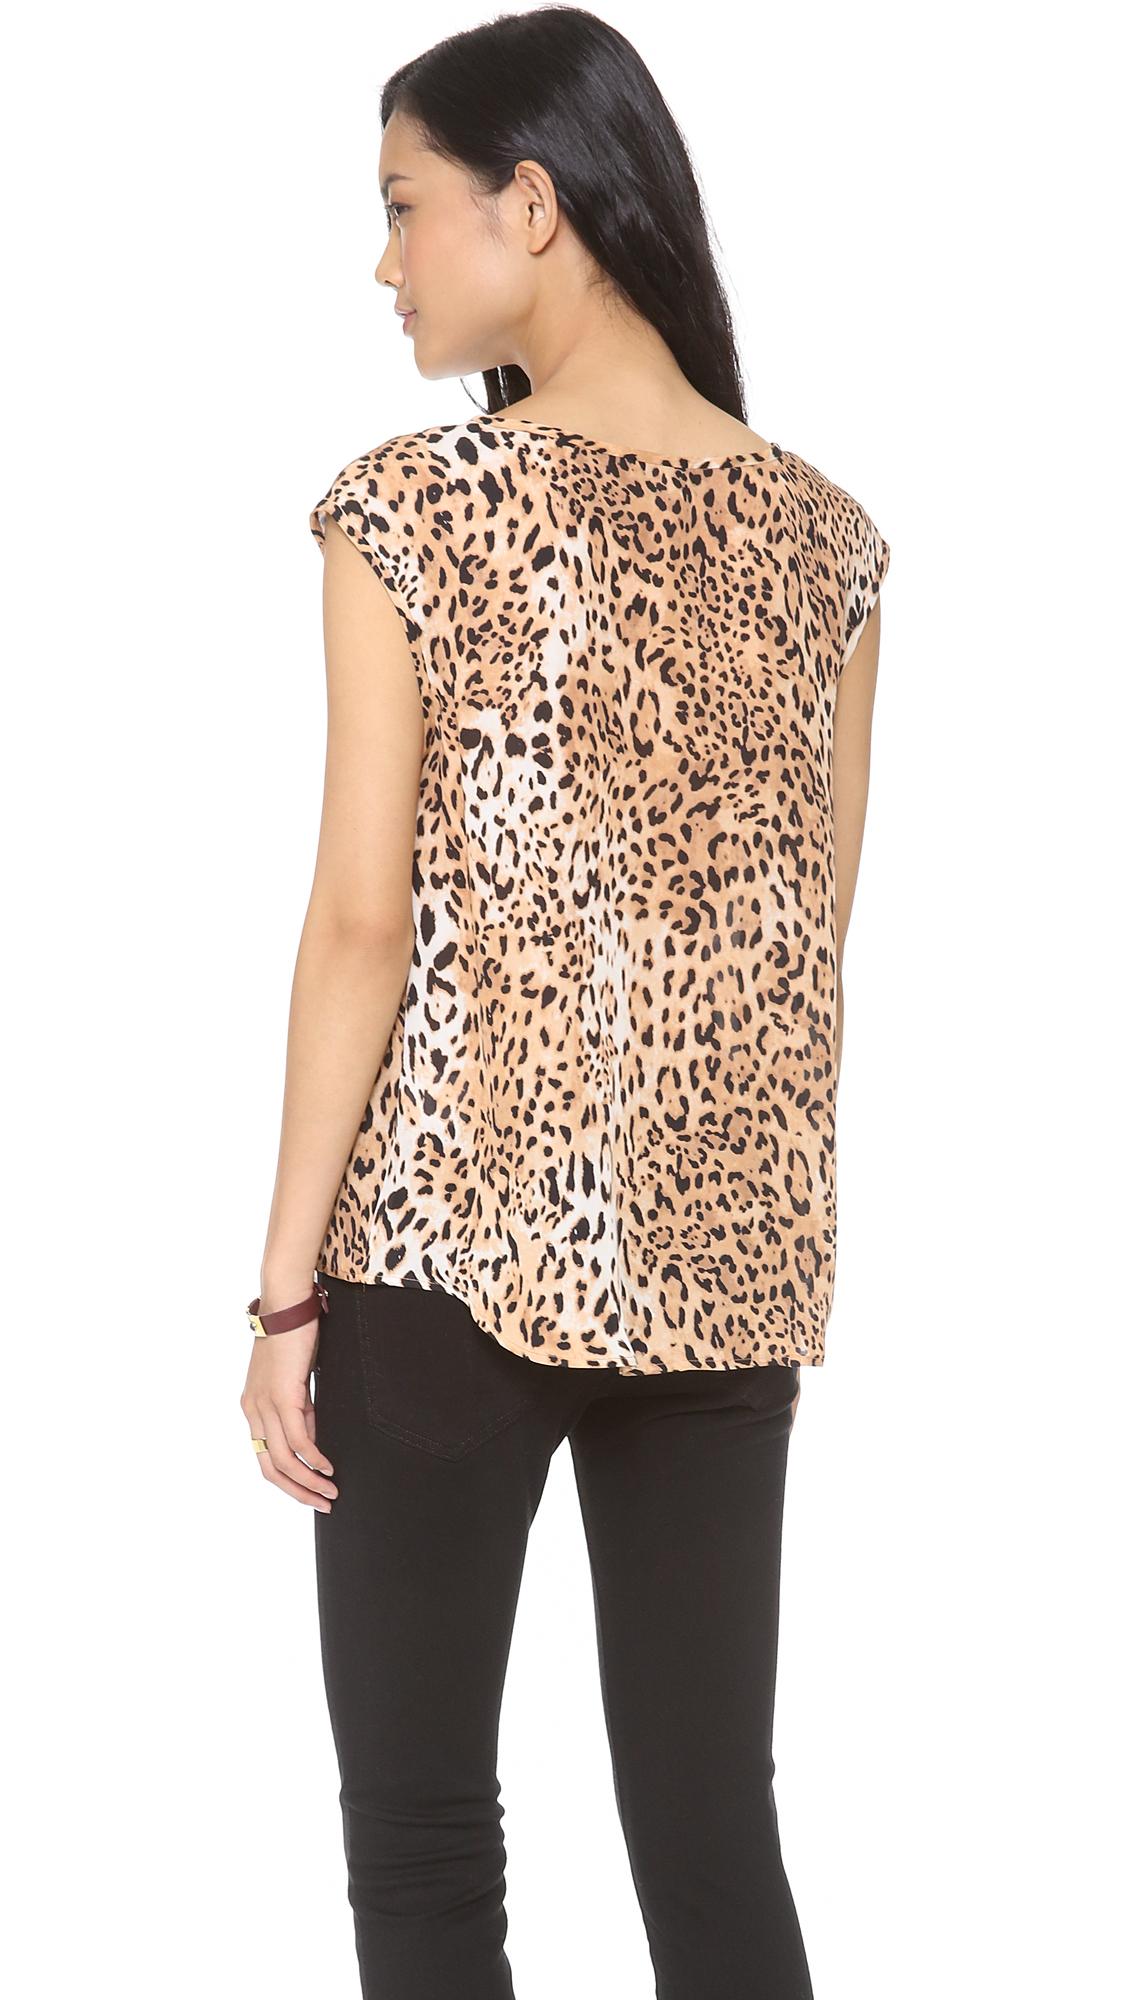 47ae6b69f1363b Joie Torrance Leopard Print Top | SHOPBOP